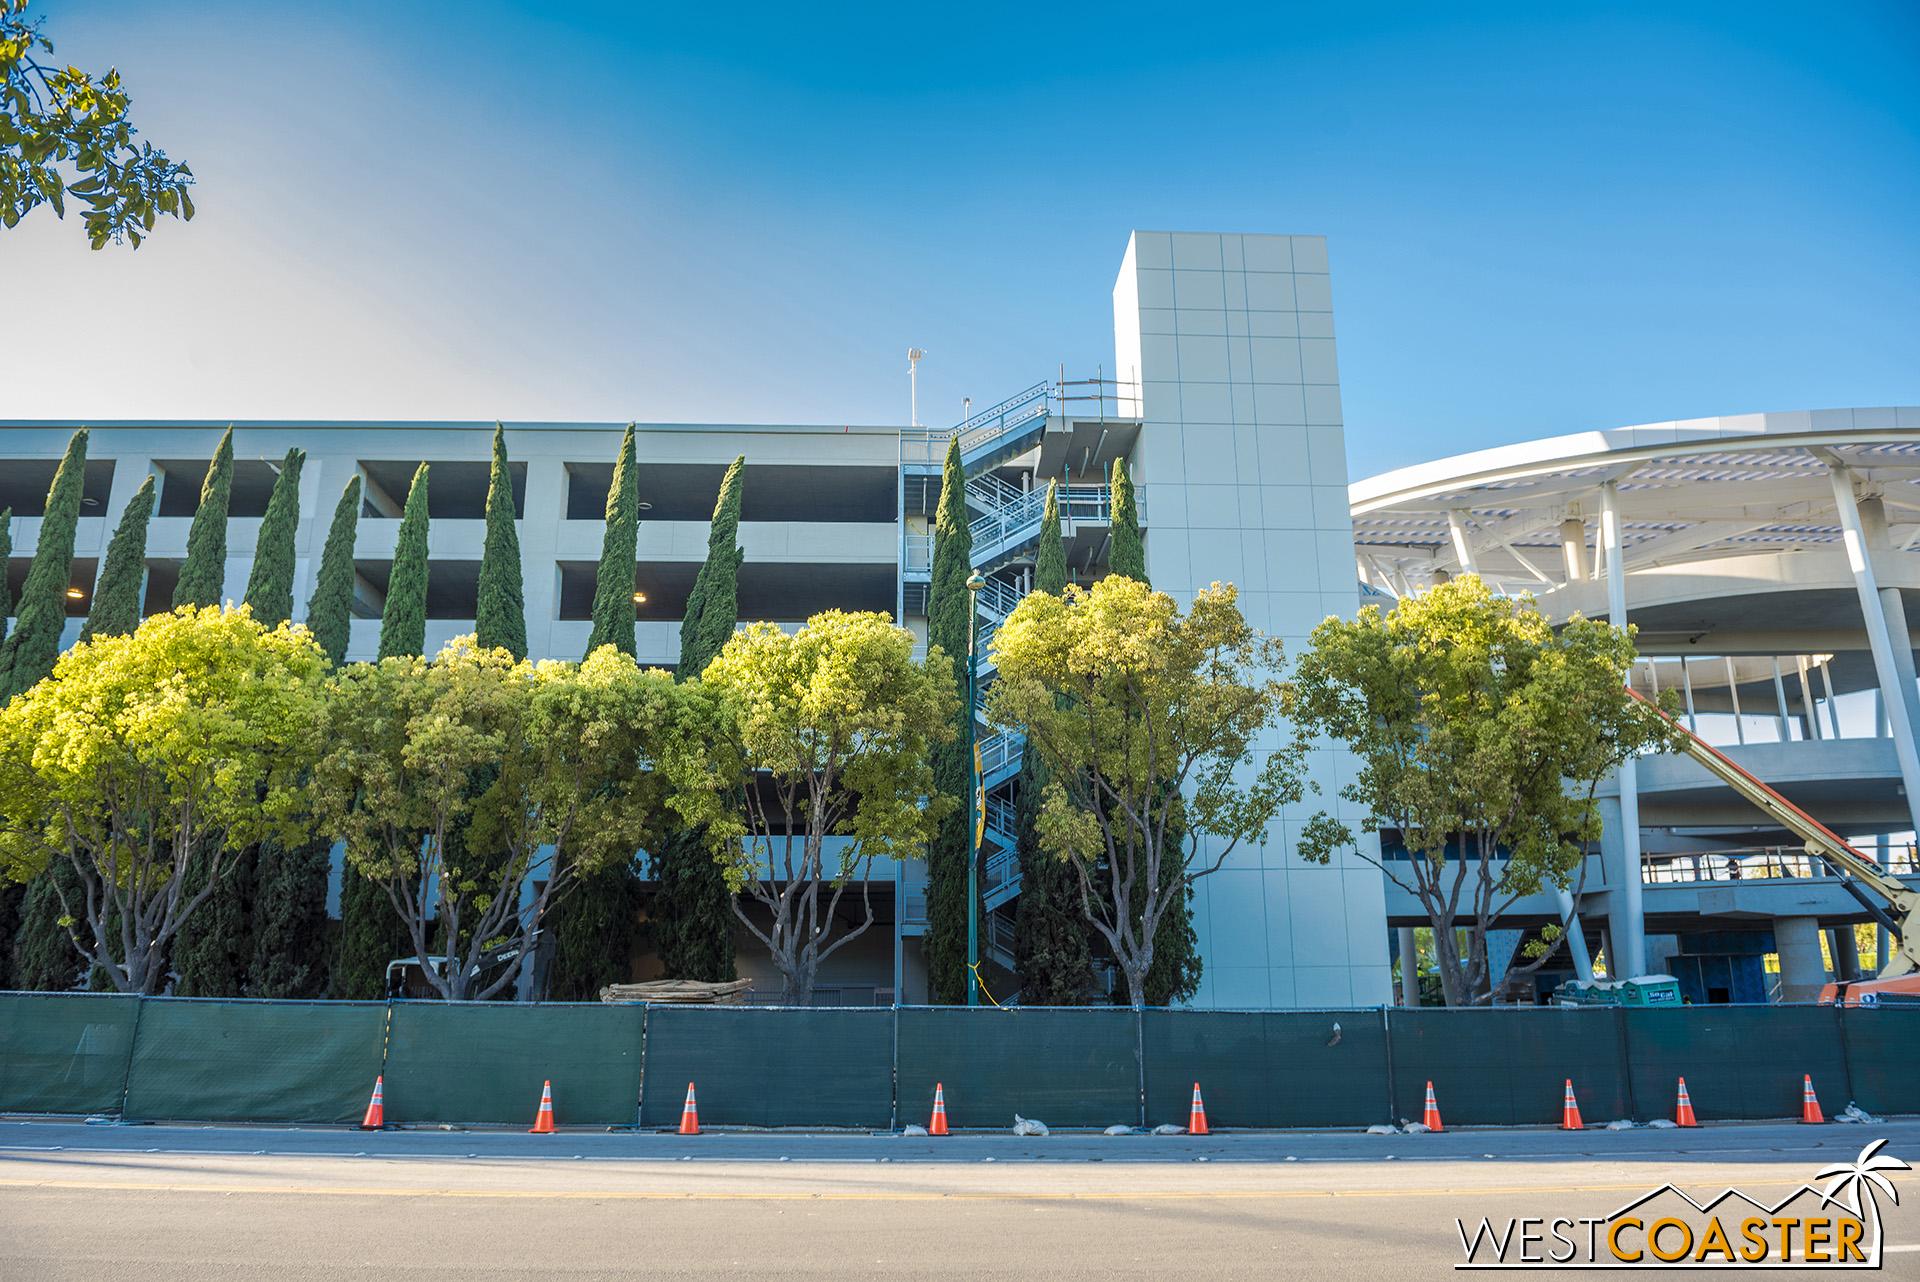 Moving along the south facade of Pixar Pals.